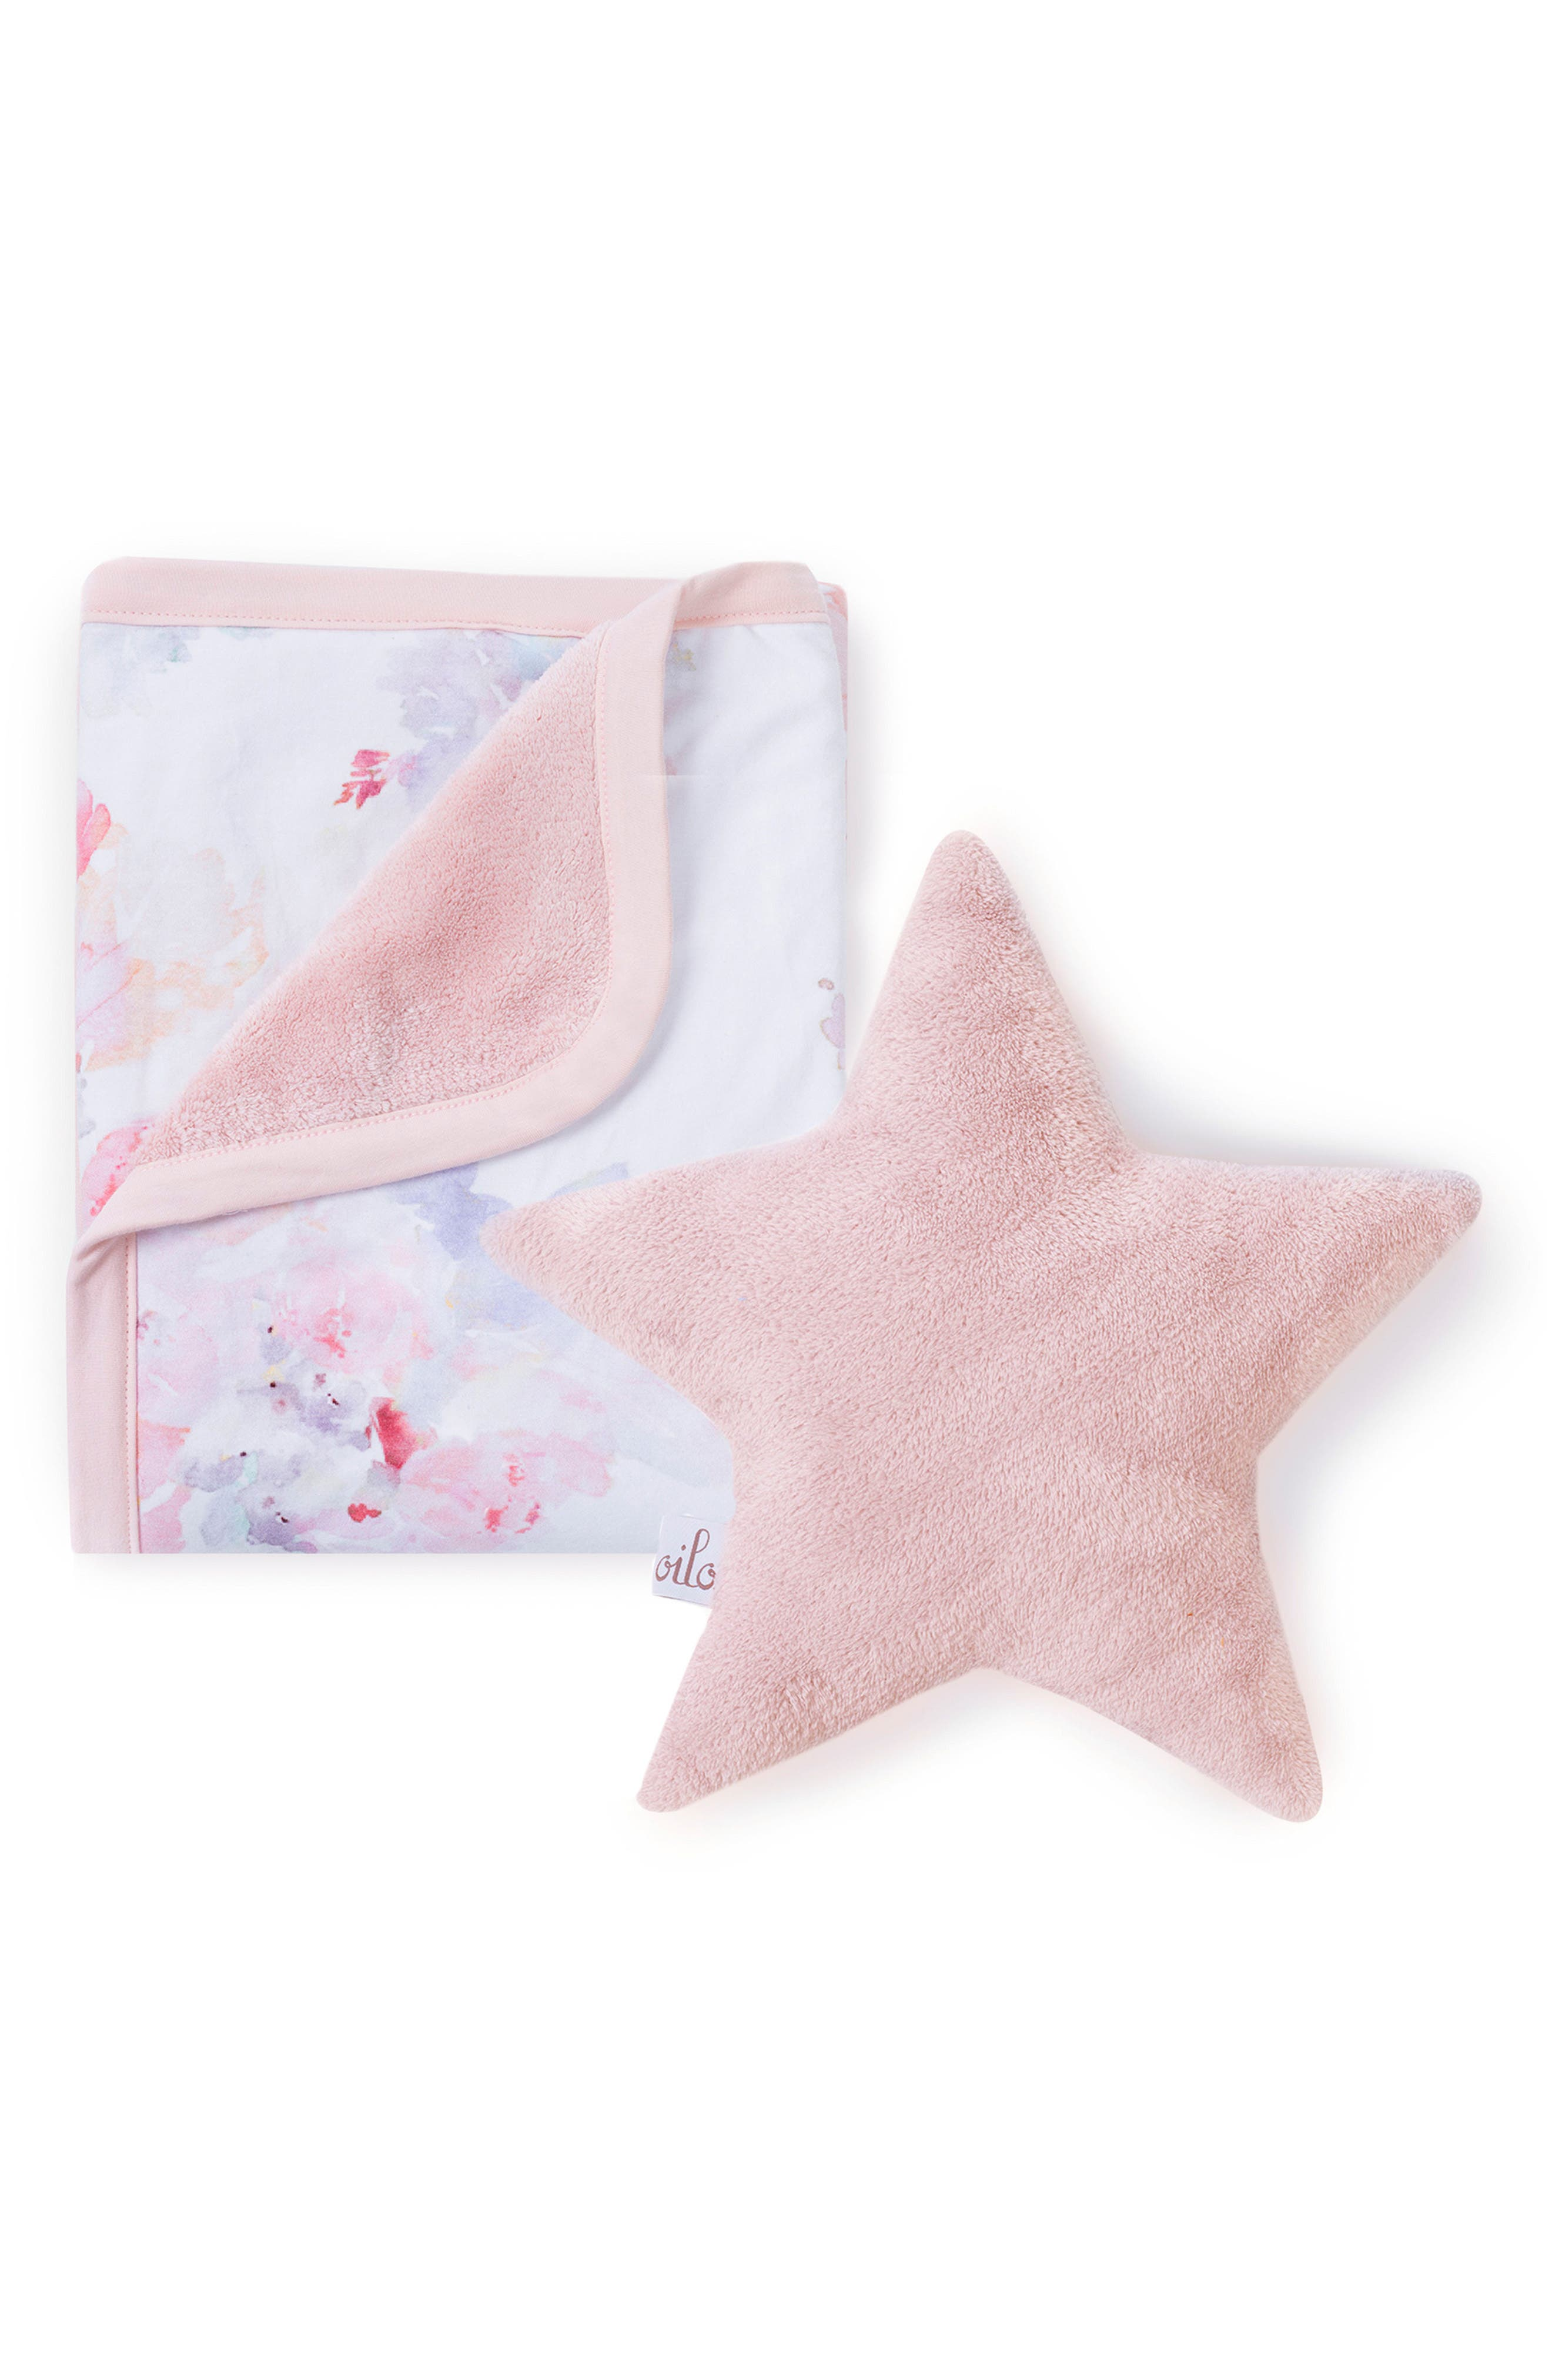 Oilo Prim Cuddle Blanket & Star Pillow Set